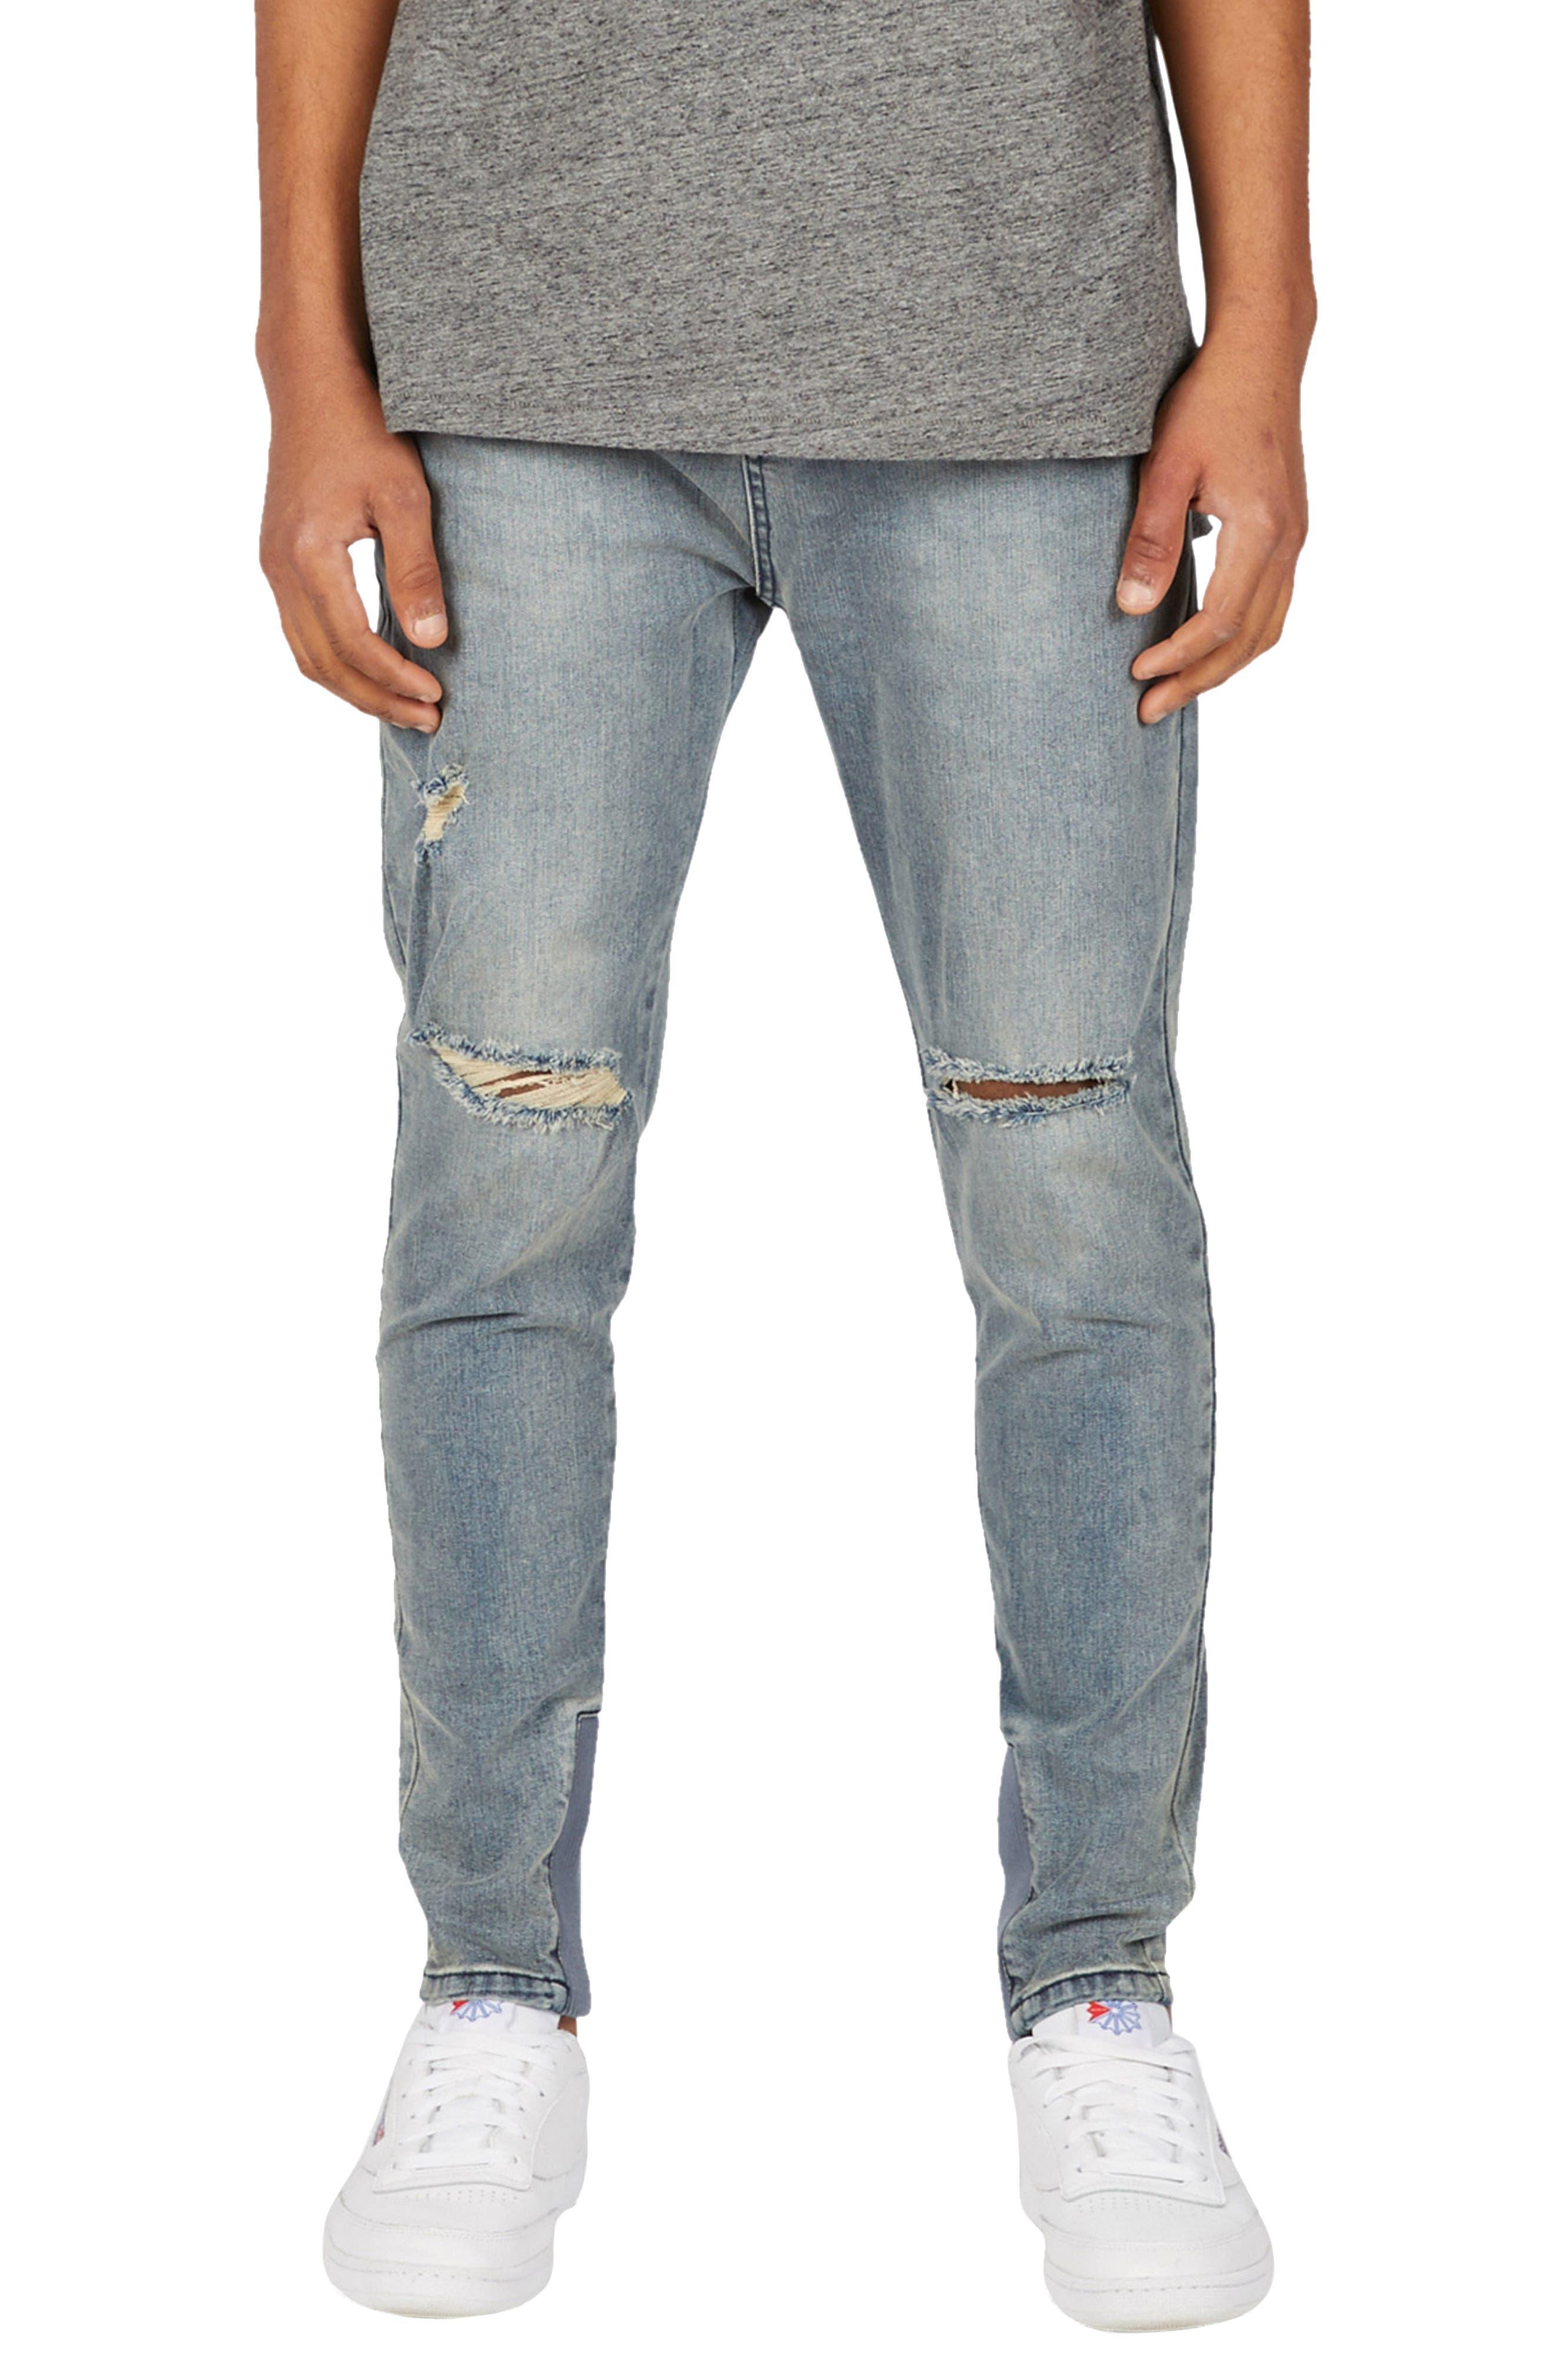 Sharpshot Slouchy Slim Fit Jeans,                             Main thumbnail 1, color,                             Double Indigo